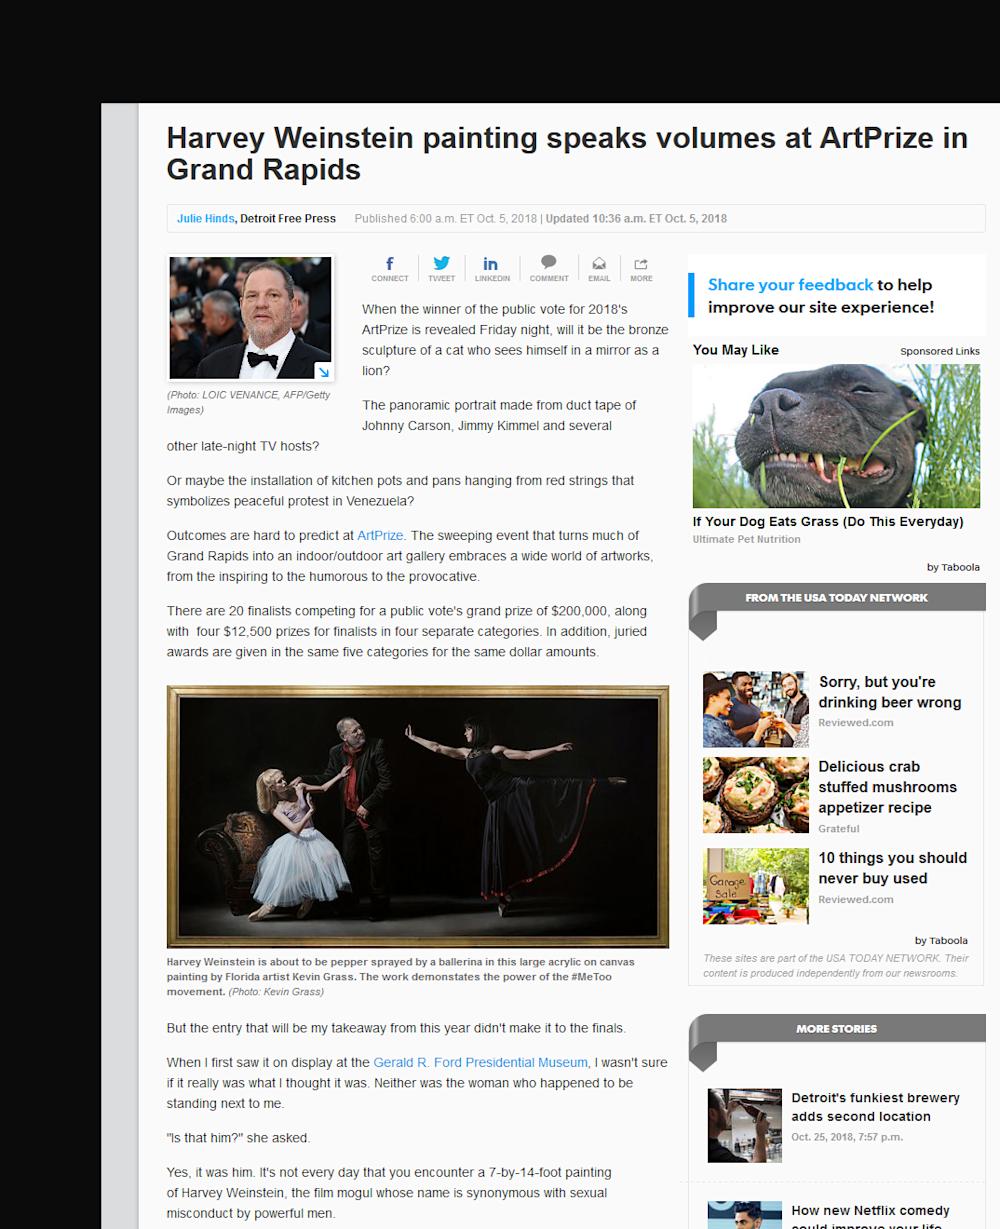 Harvey Weinstein painting speaks volumes at ArtPrize in Grand Rapids article in Detroit Free Press